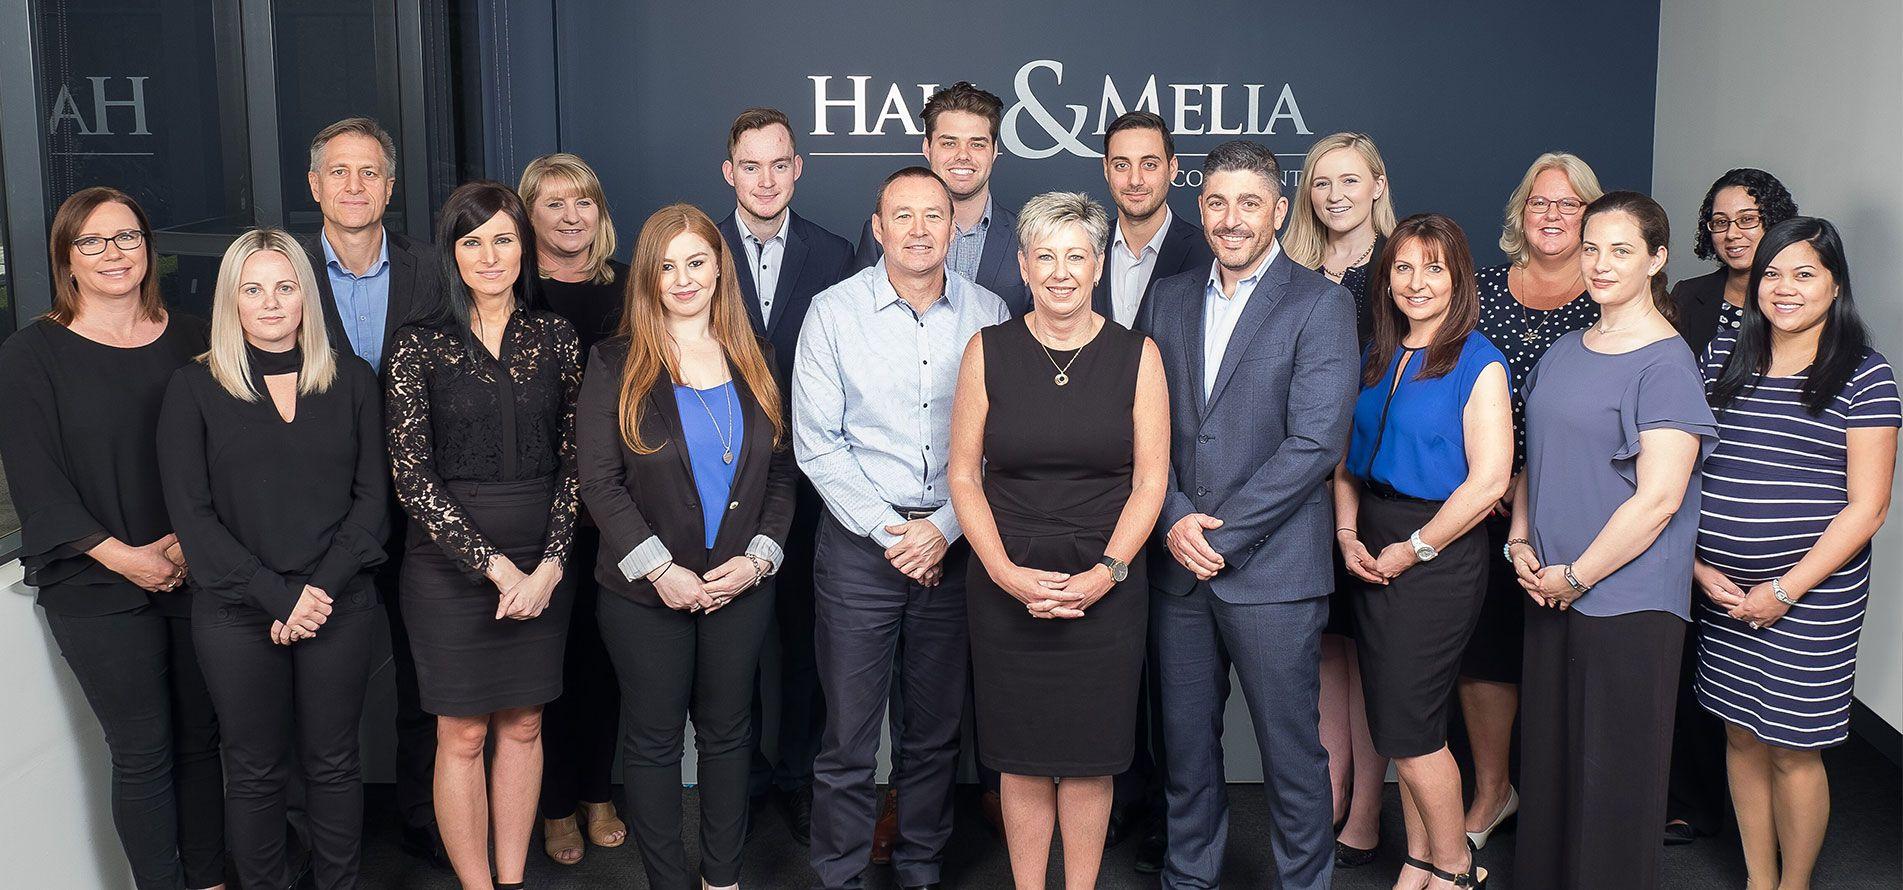 Hall & Melia Accountants